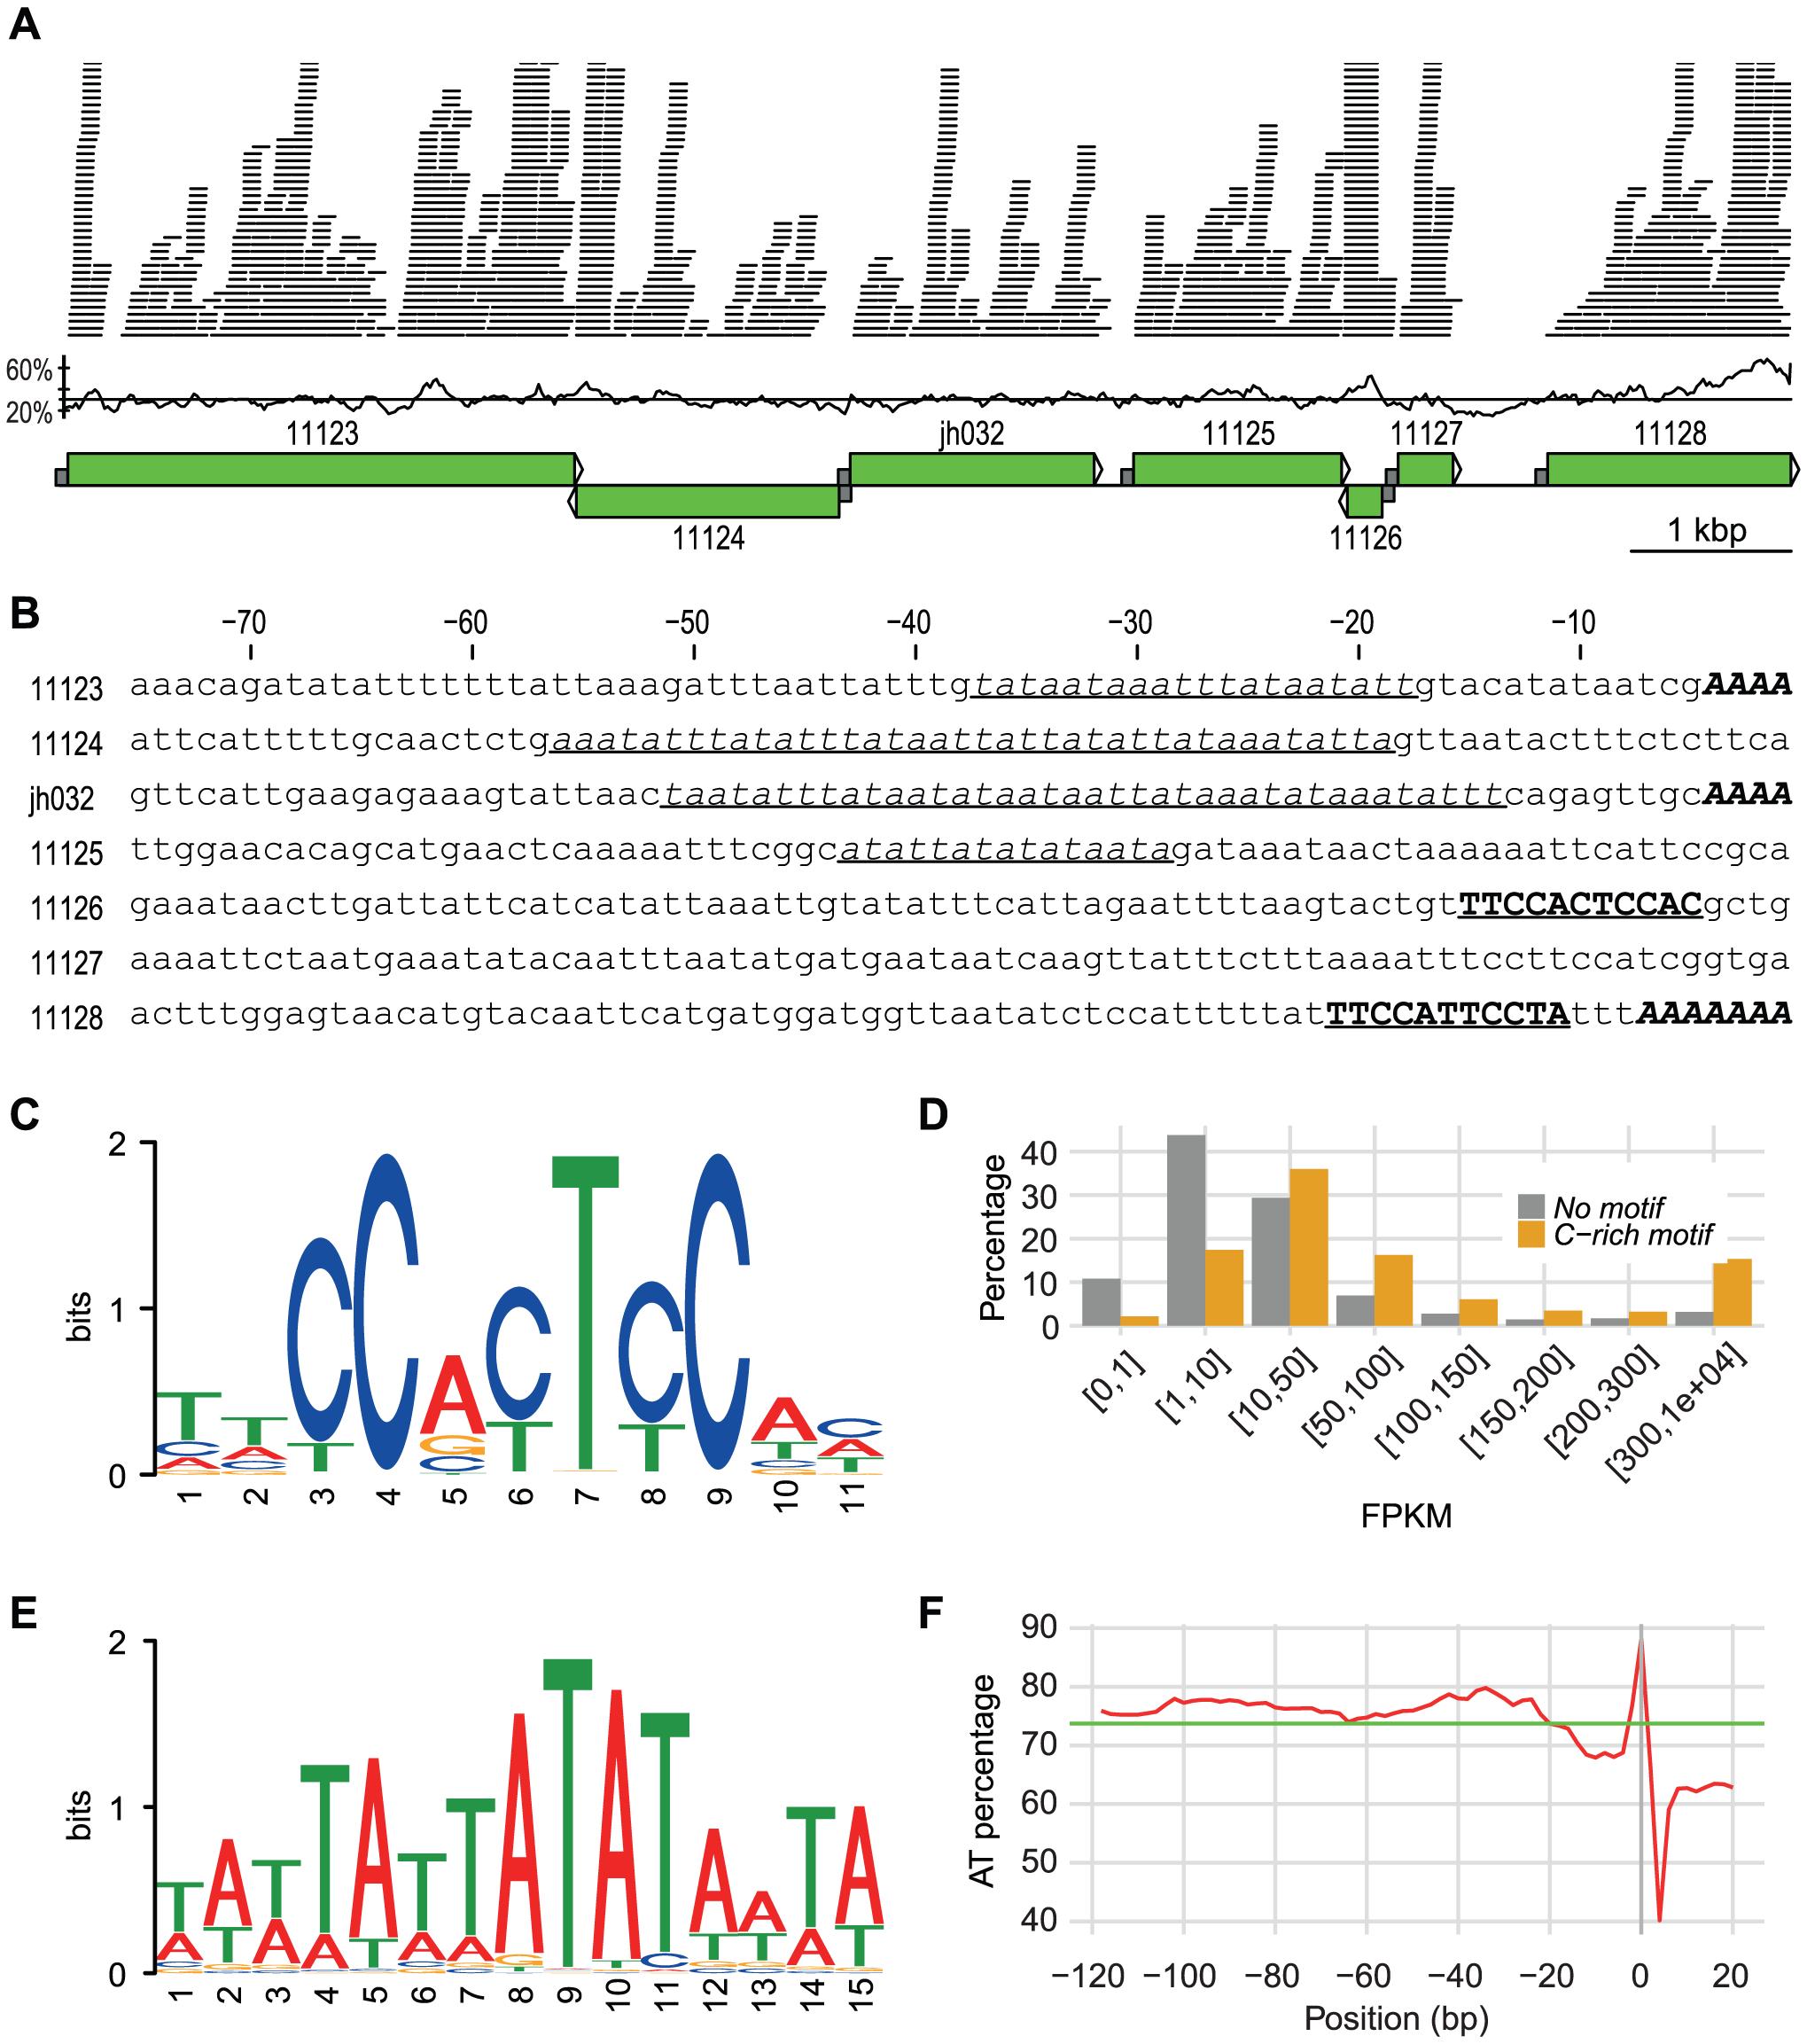 A 10 kbp genomic region with promoter info.